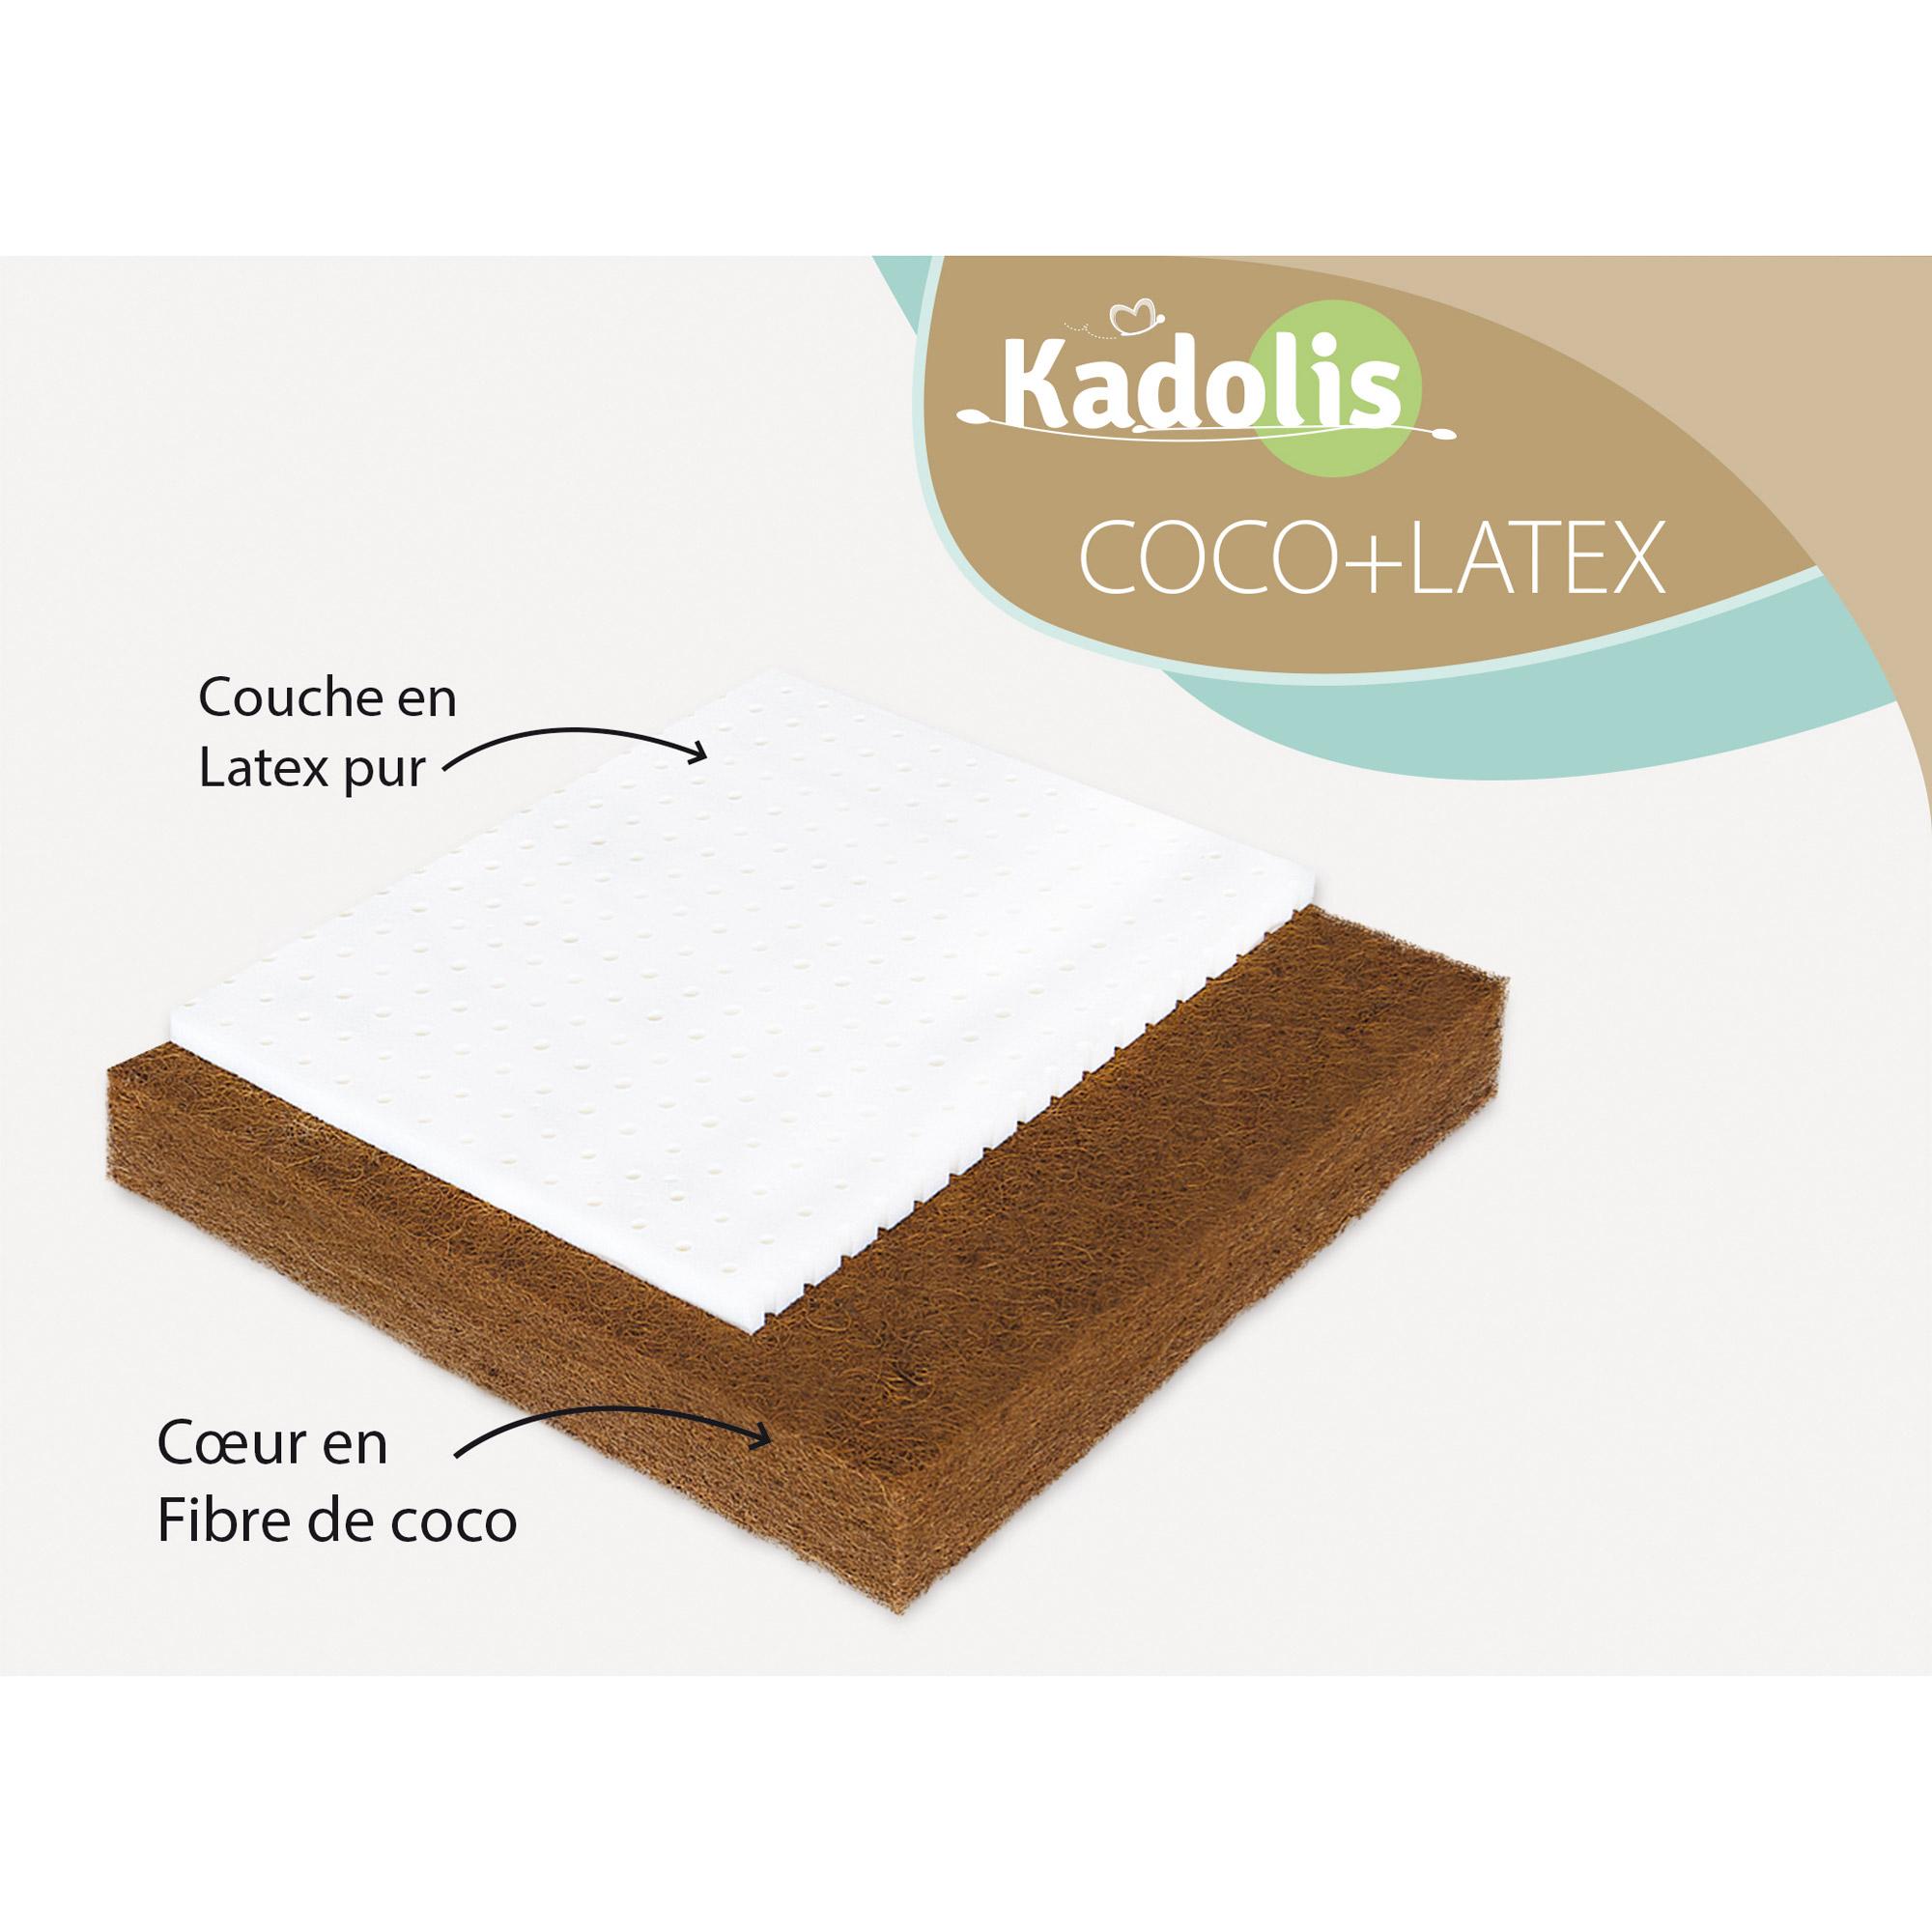 Kadolis Matelas Berceau Coco Latex 40 X 80 Cm Comparer Avec